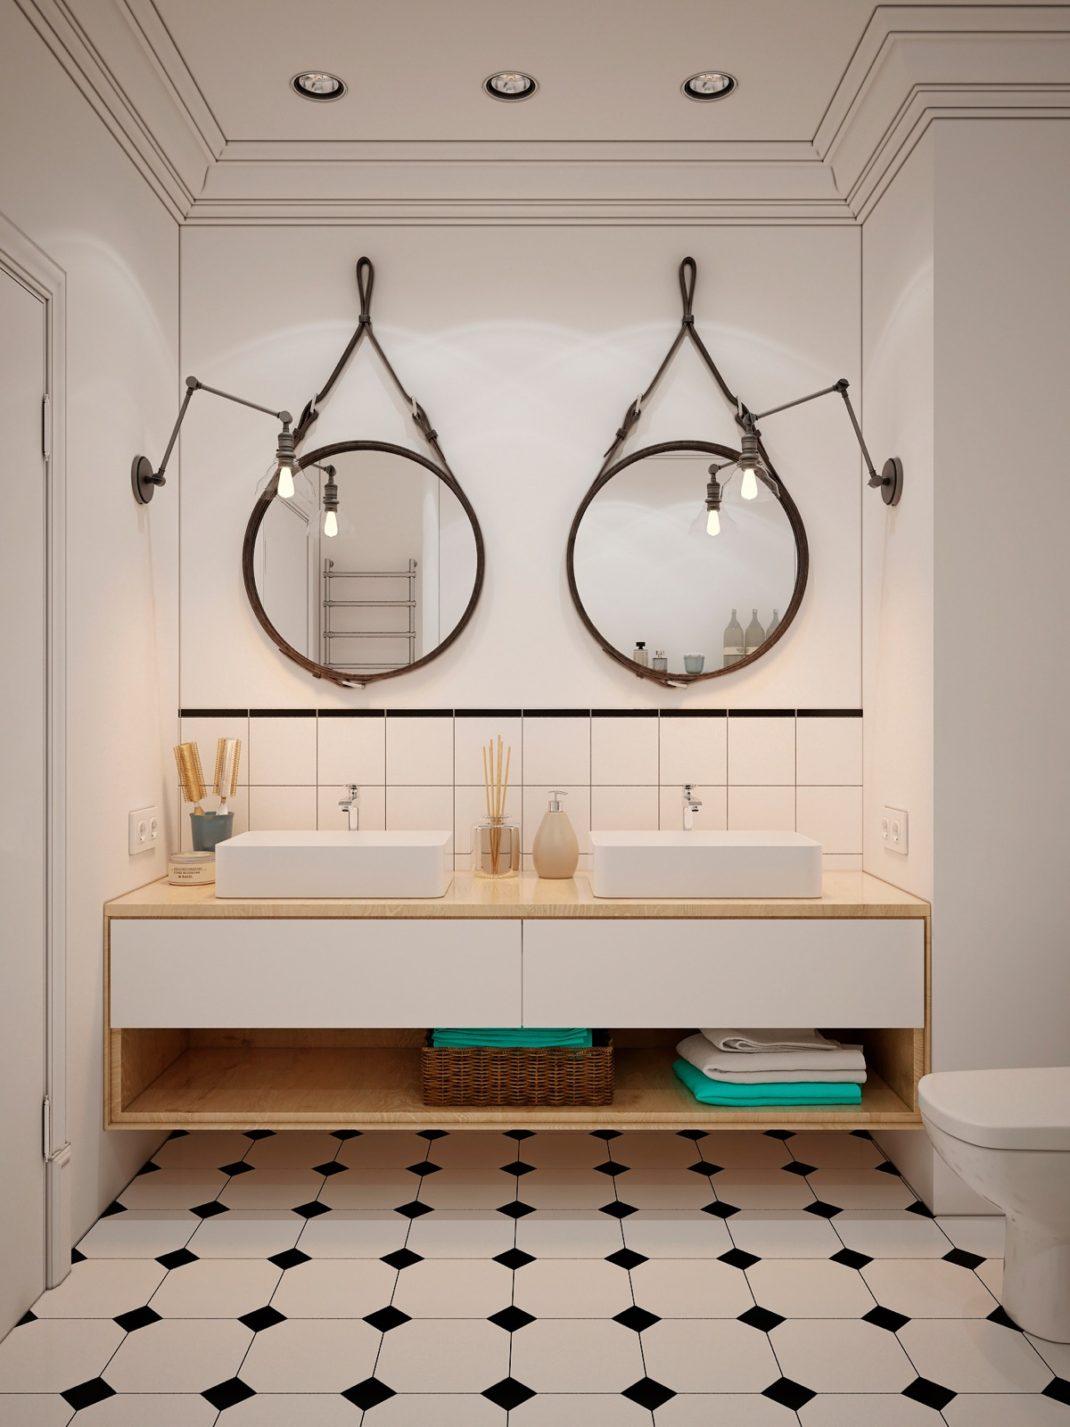 Emejing Salle De Bain Vasque Separe Ideas - House Design ...